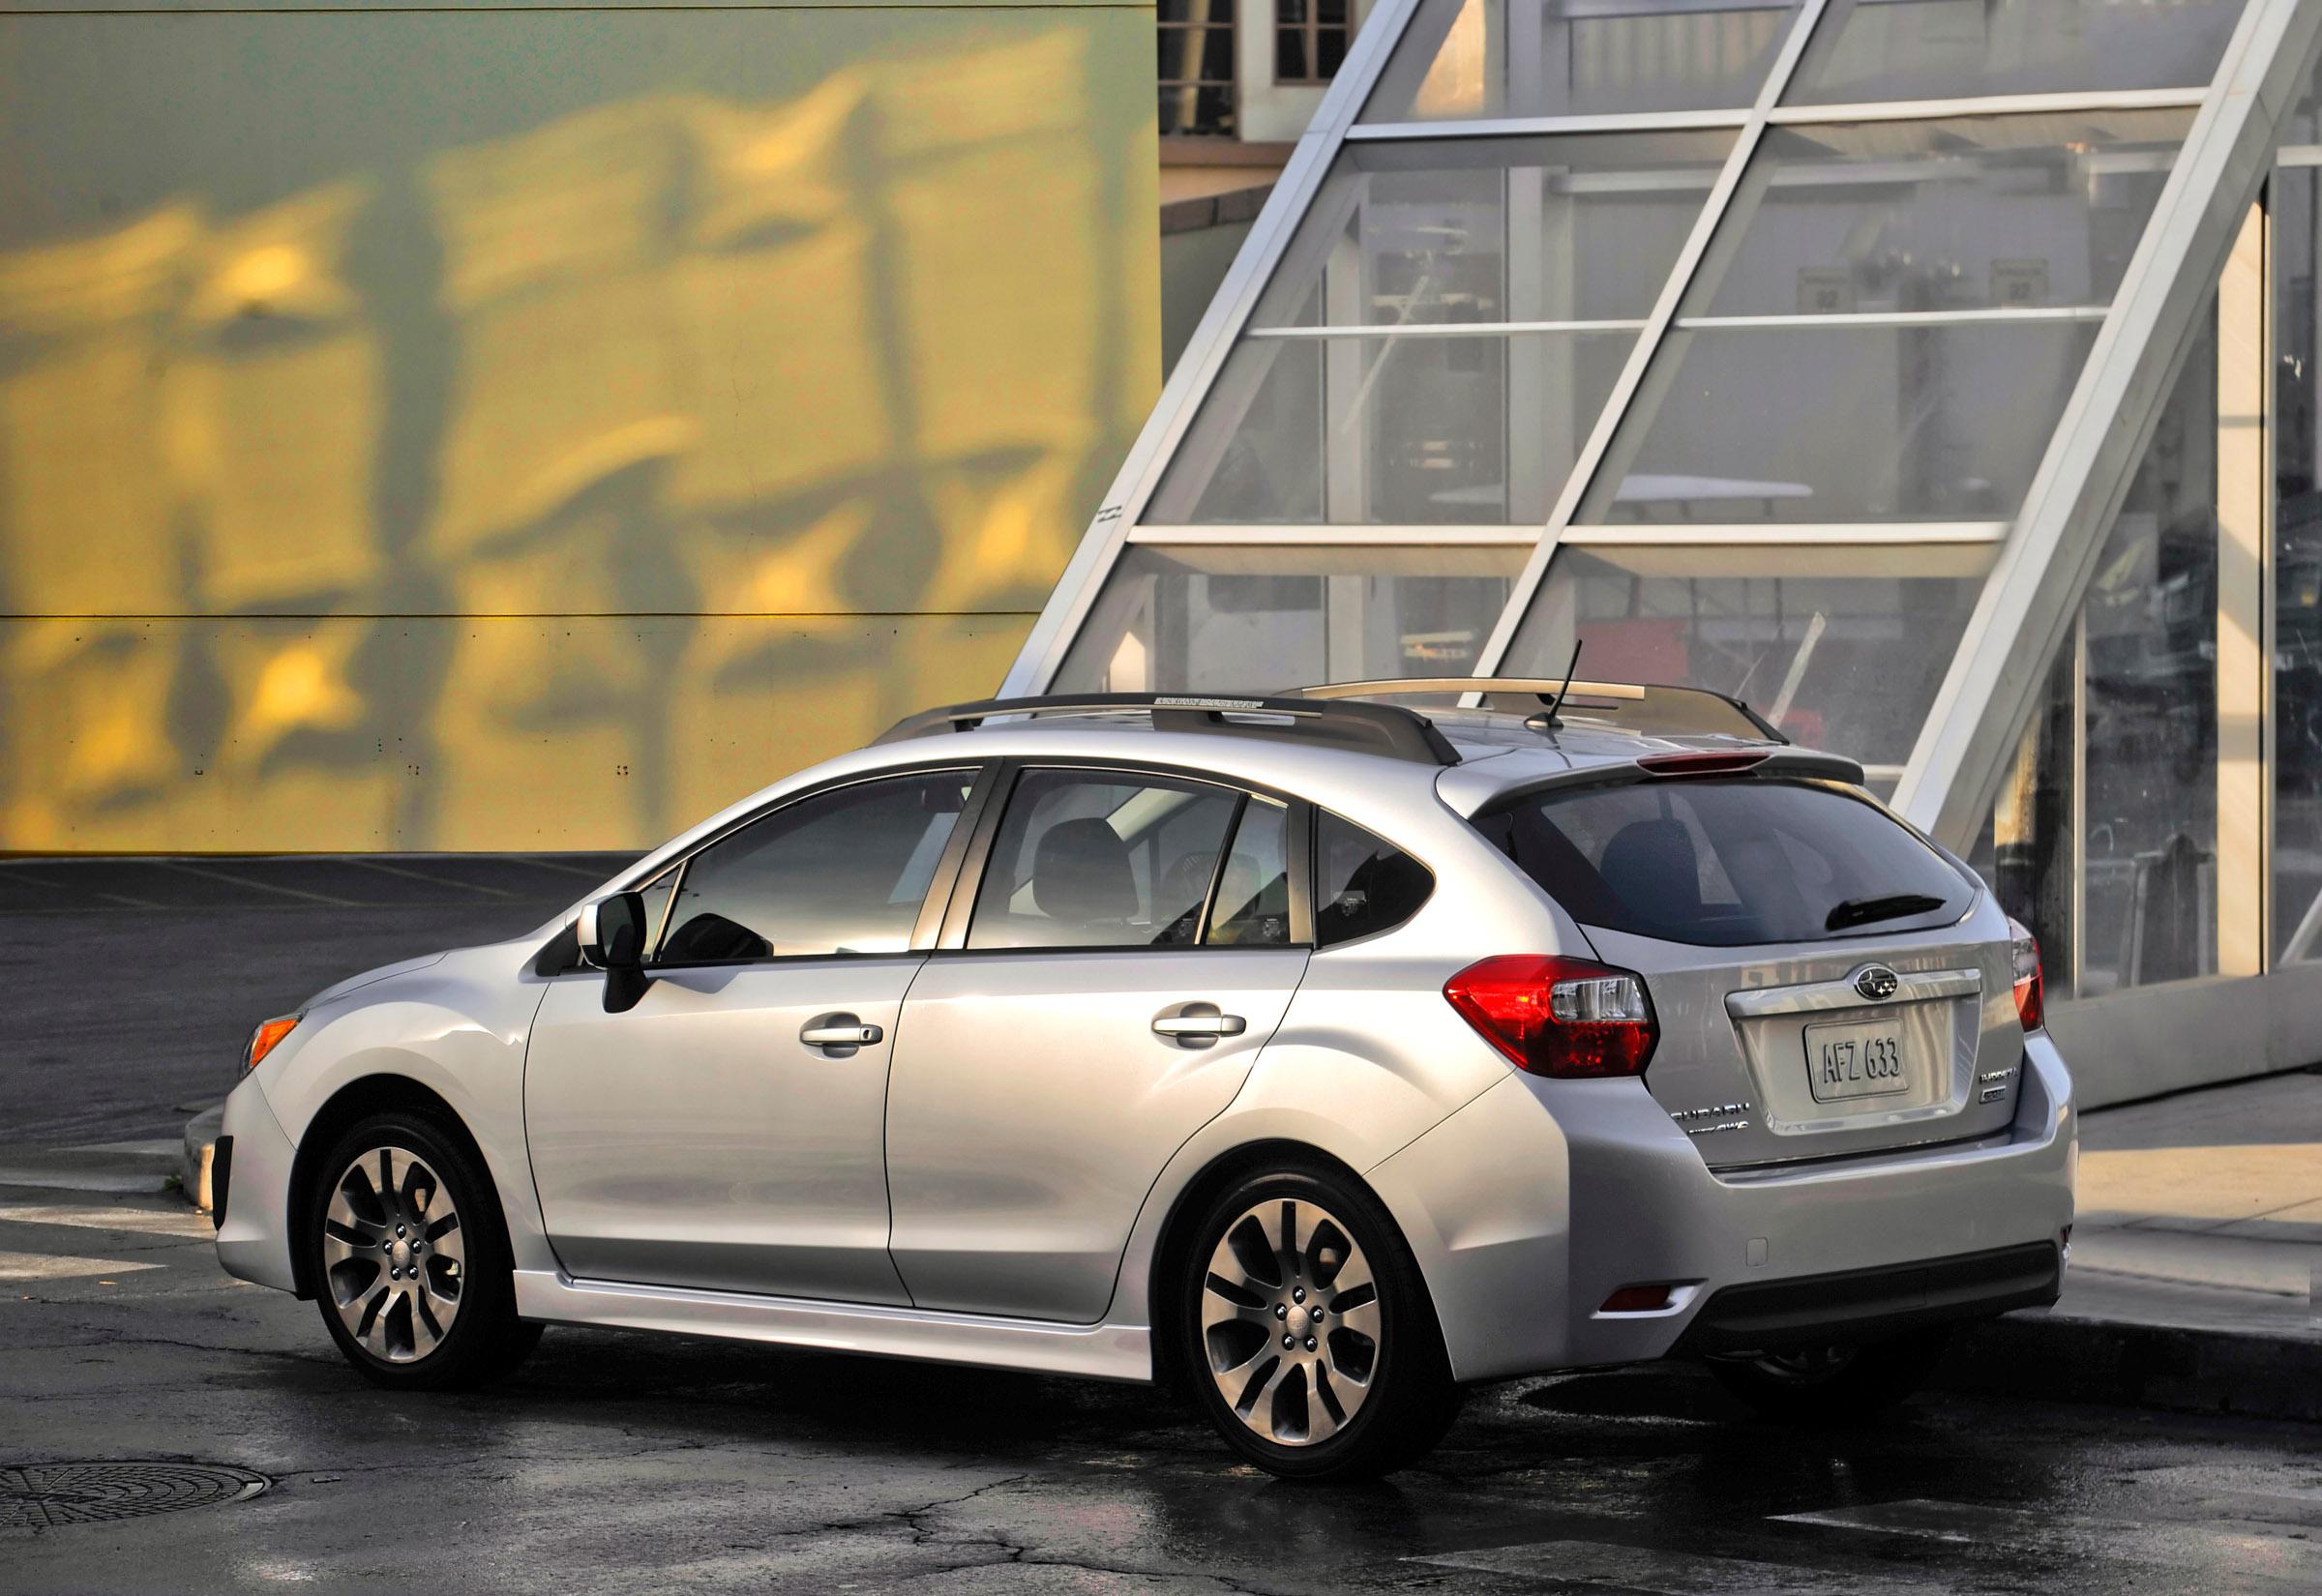 2012 Subaru Impreza 2 0i Sport Limited 5 Door Picture 53337